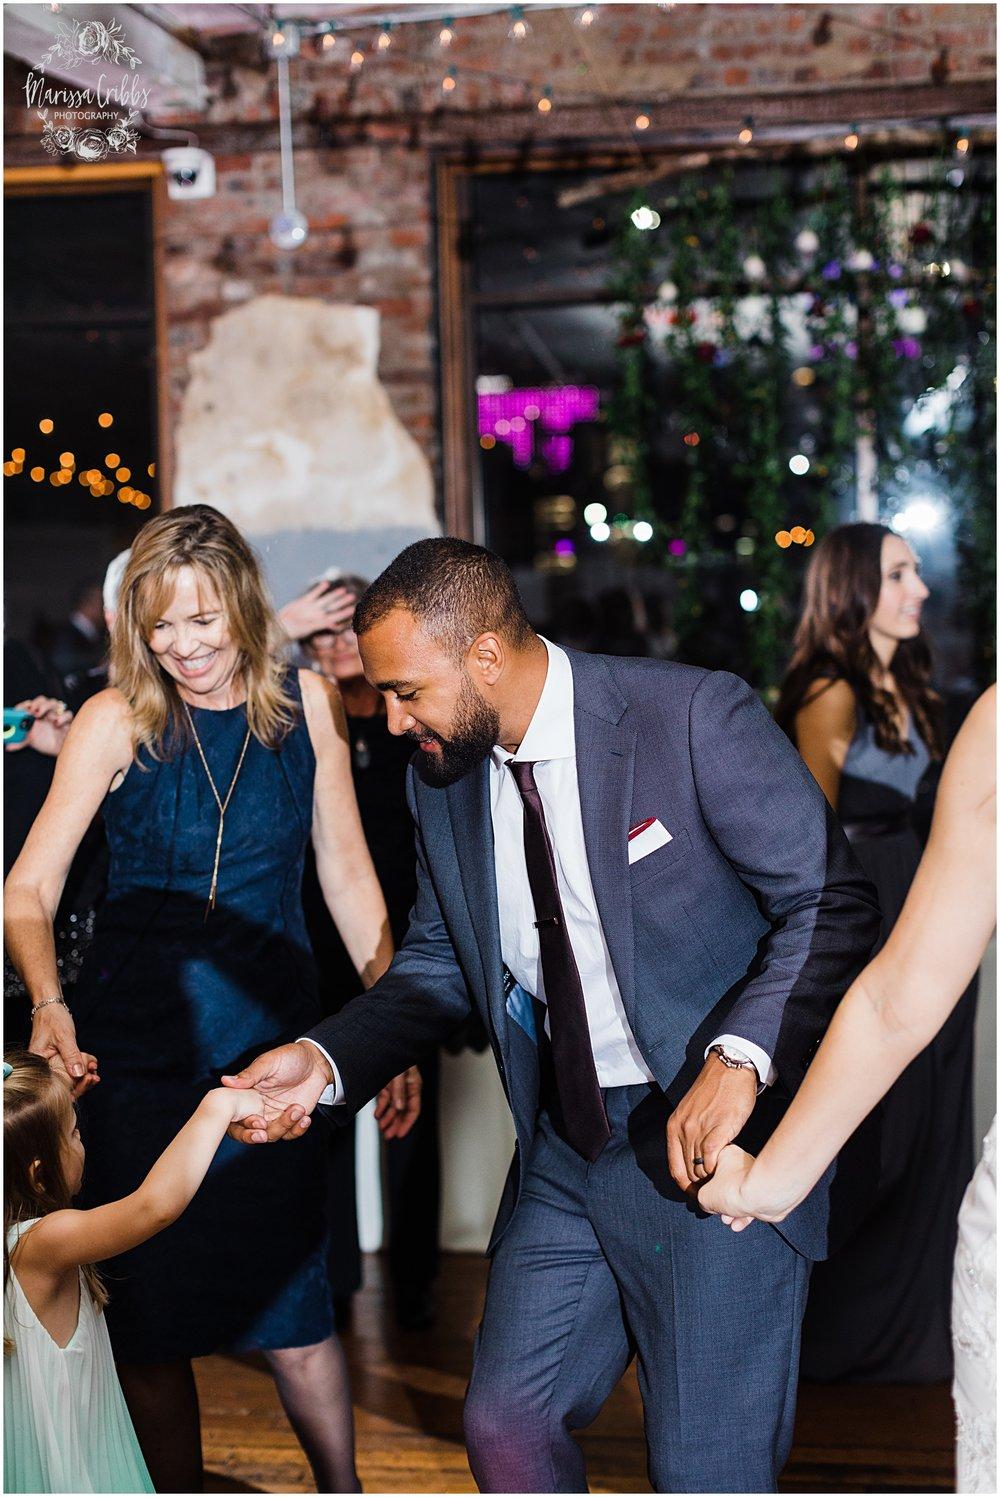 BAUER WEDDING | KELSEA & JUSTIN | MARISSA CRIBBS PHOTOGRAPHY_6614.jpg